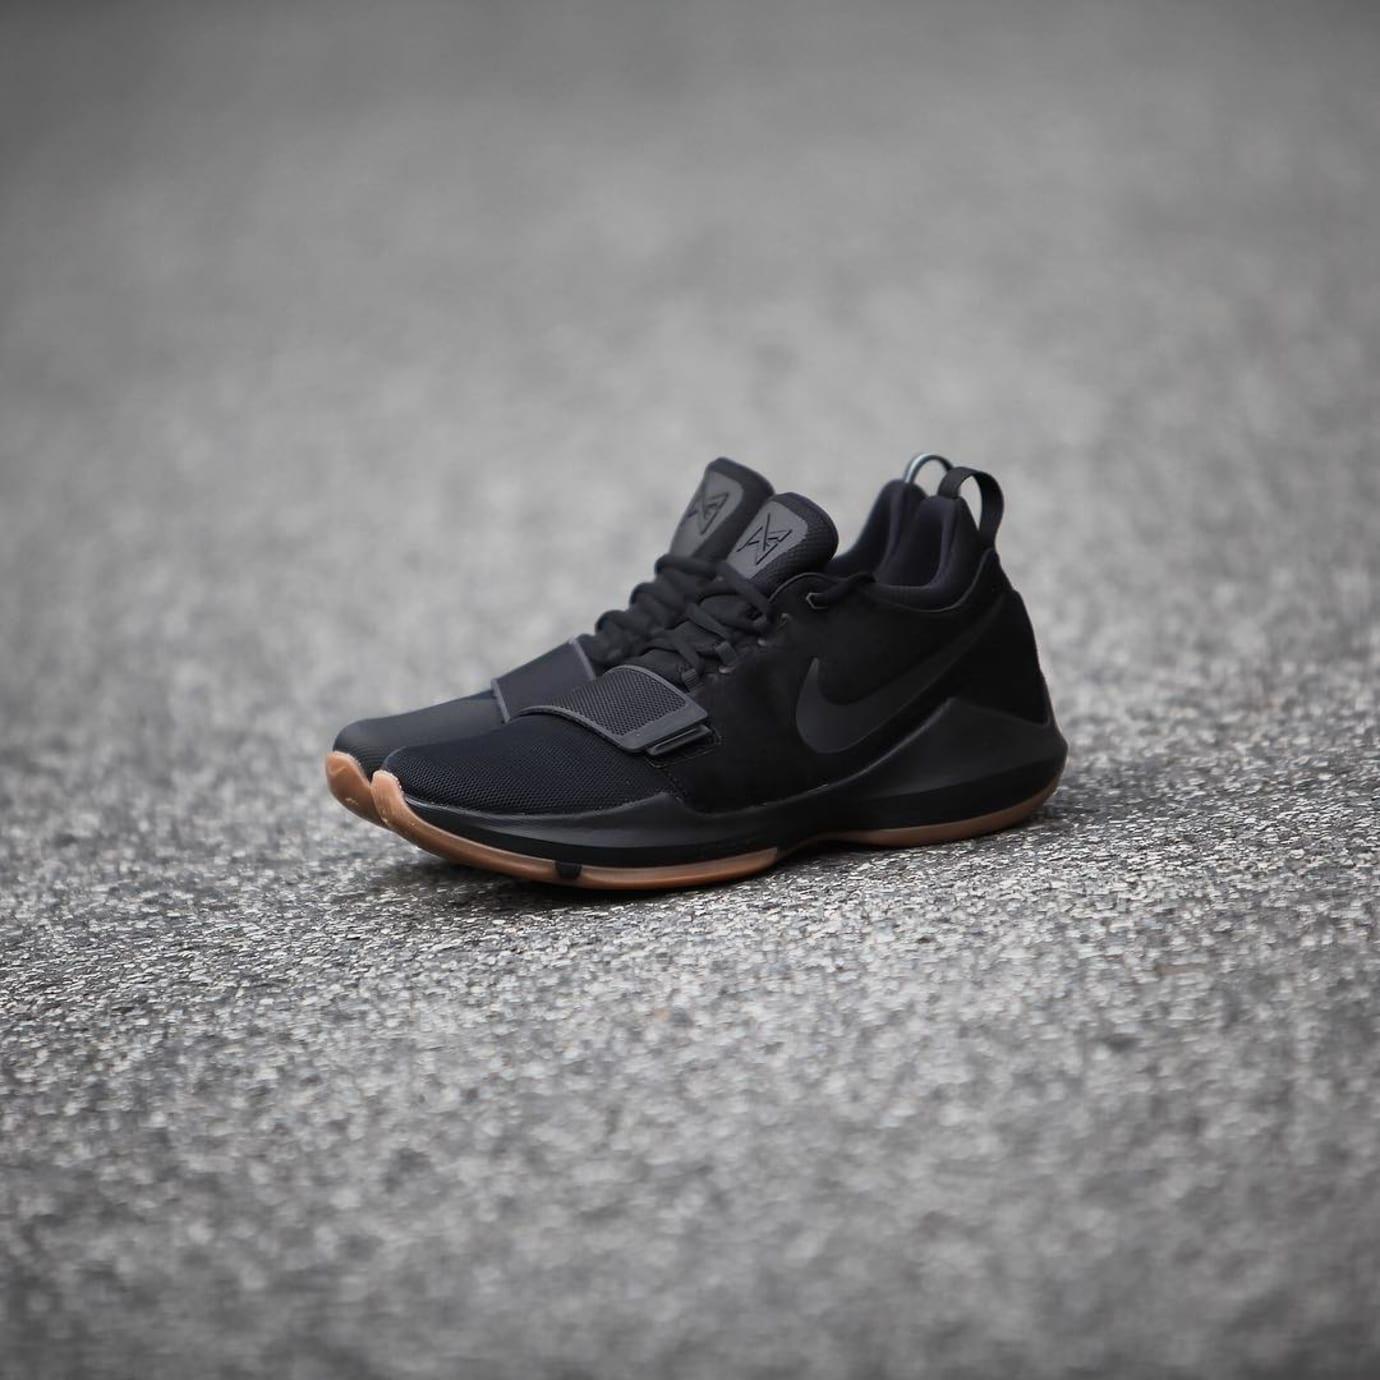 Nike PG1 Black Gum Release Date 878627-004 (2)